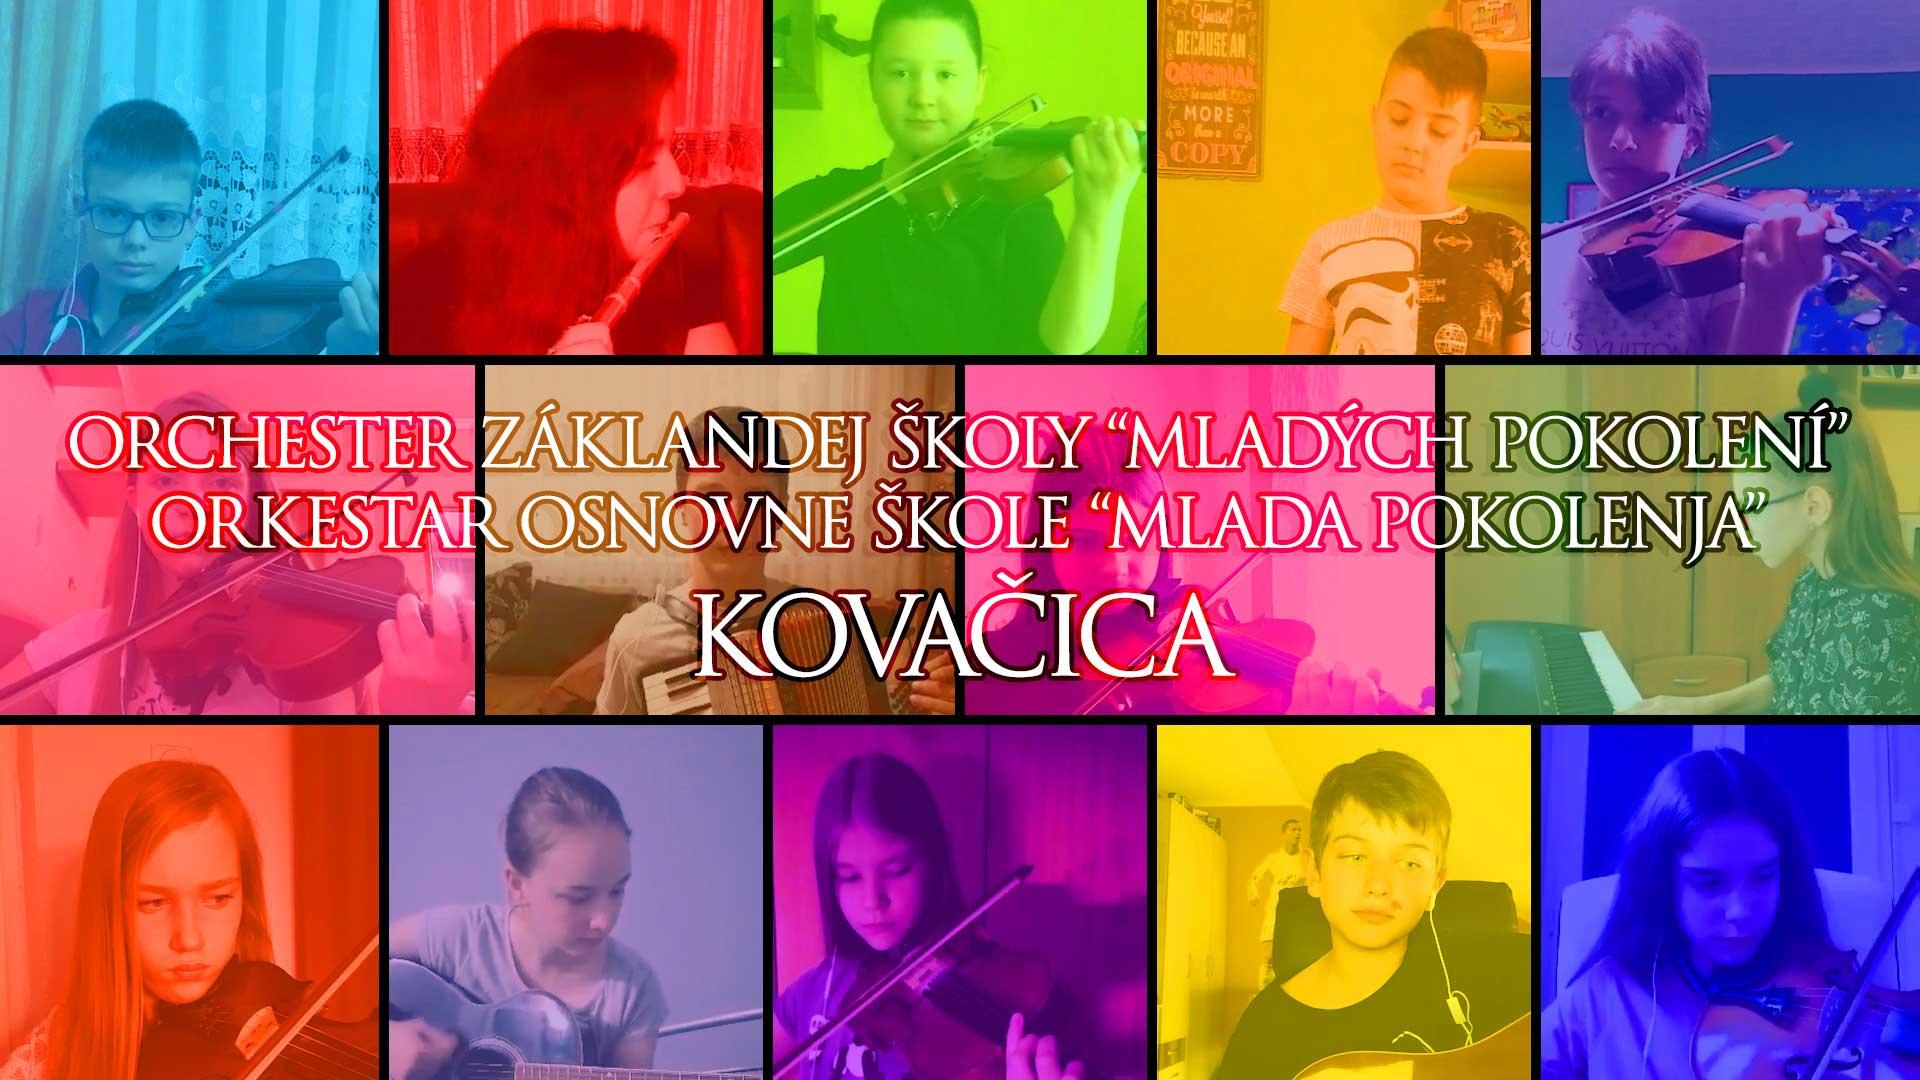 Orkestar Osnovne škole Mlada pokolenja Kovačica – Kad radost i veselja slast (J. S. Bach)